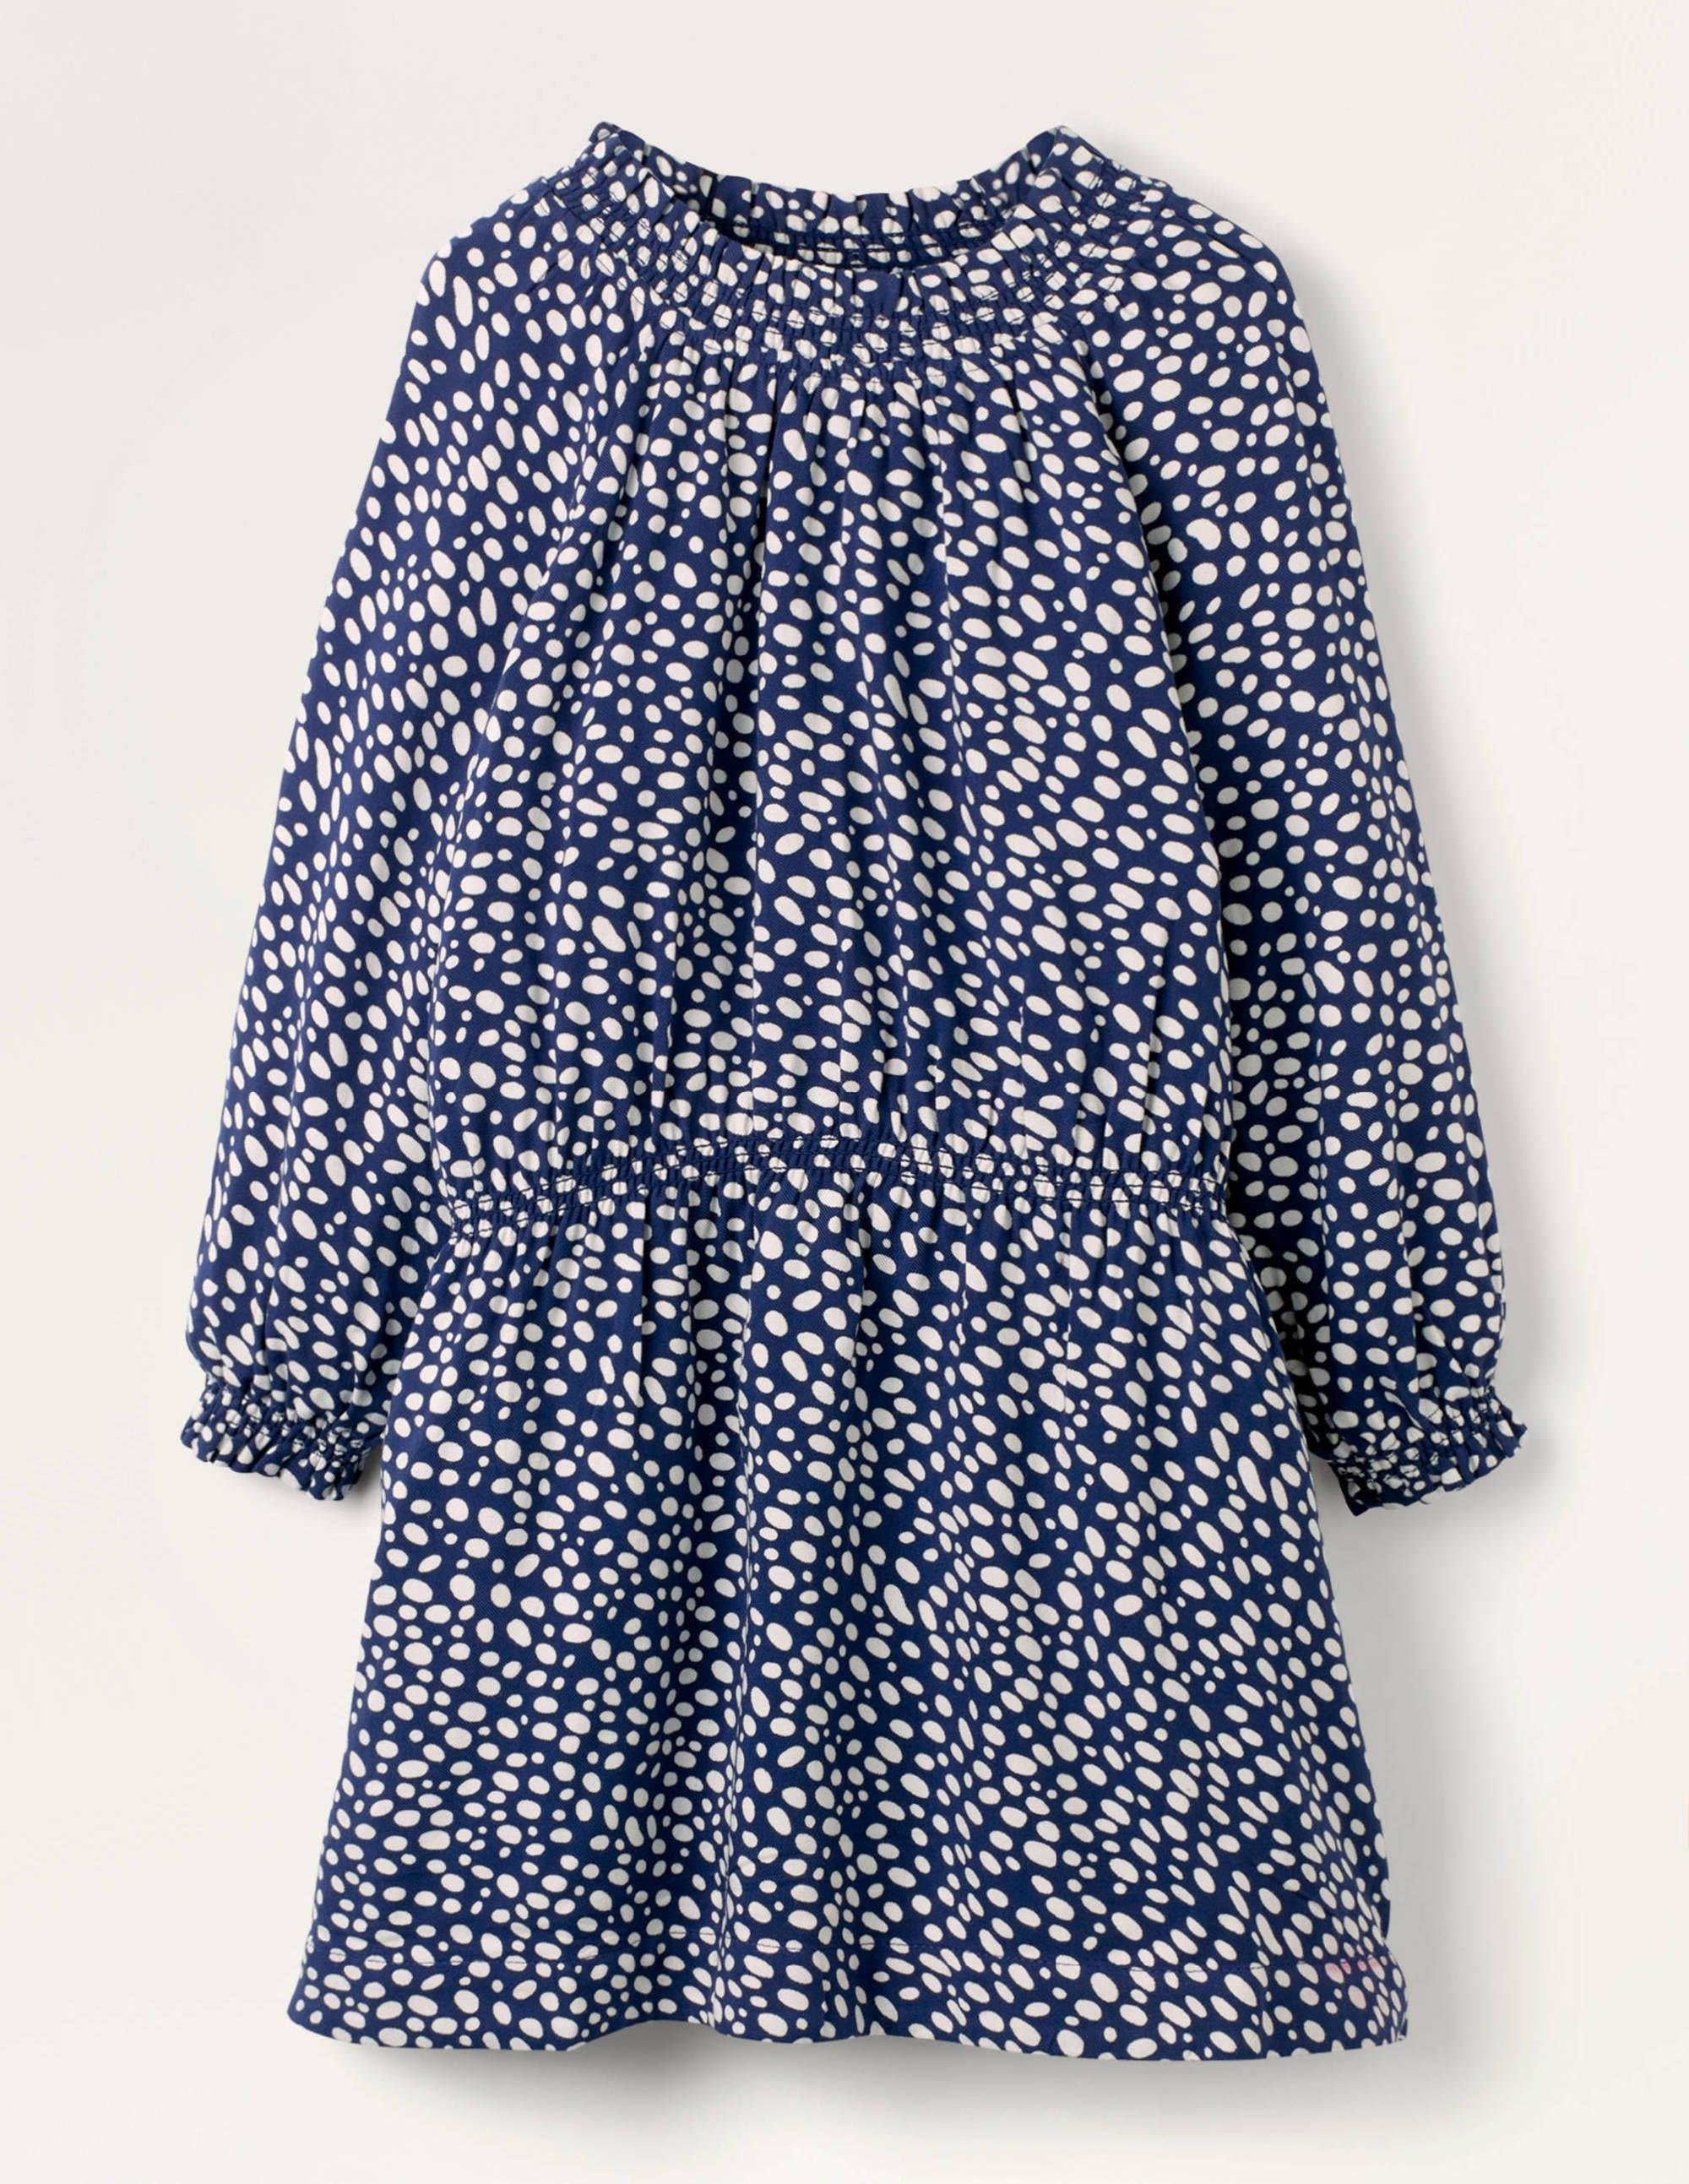 Boden Smocked Spot Woven Dress - Navy/Ivory Dalmatian Spot